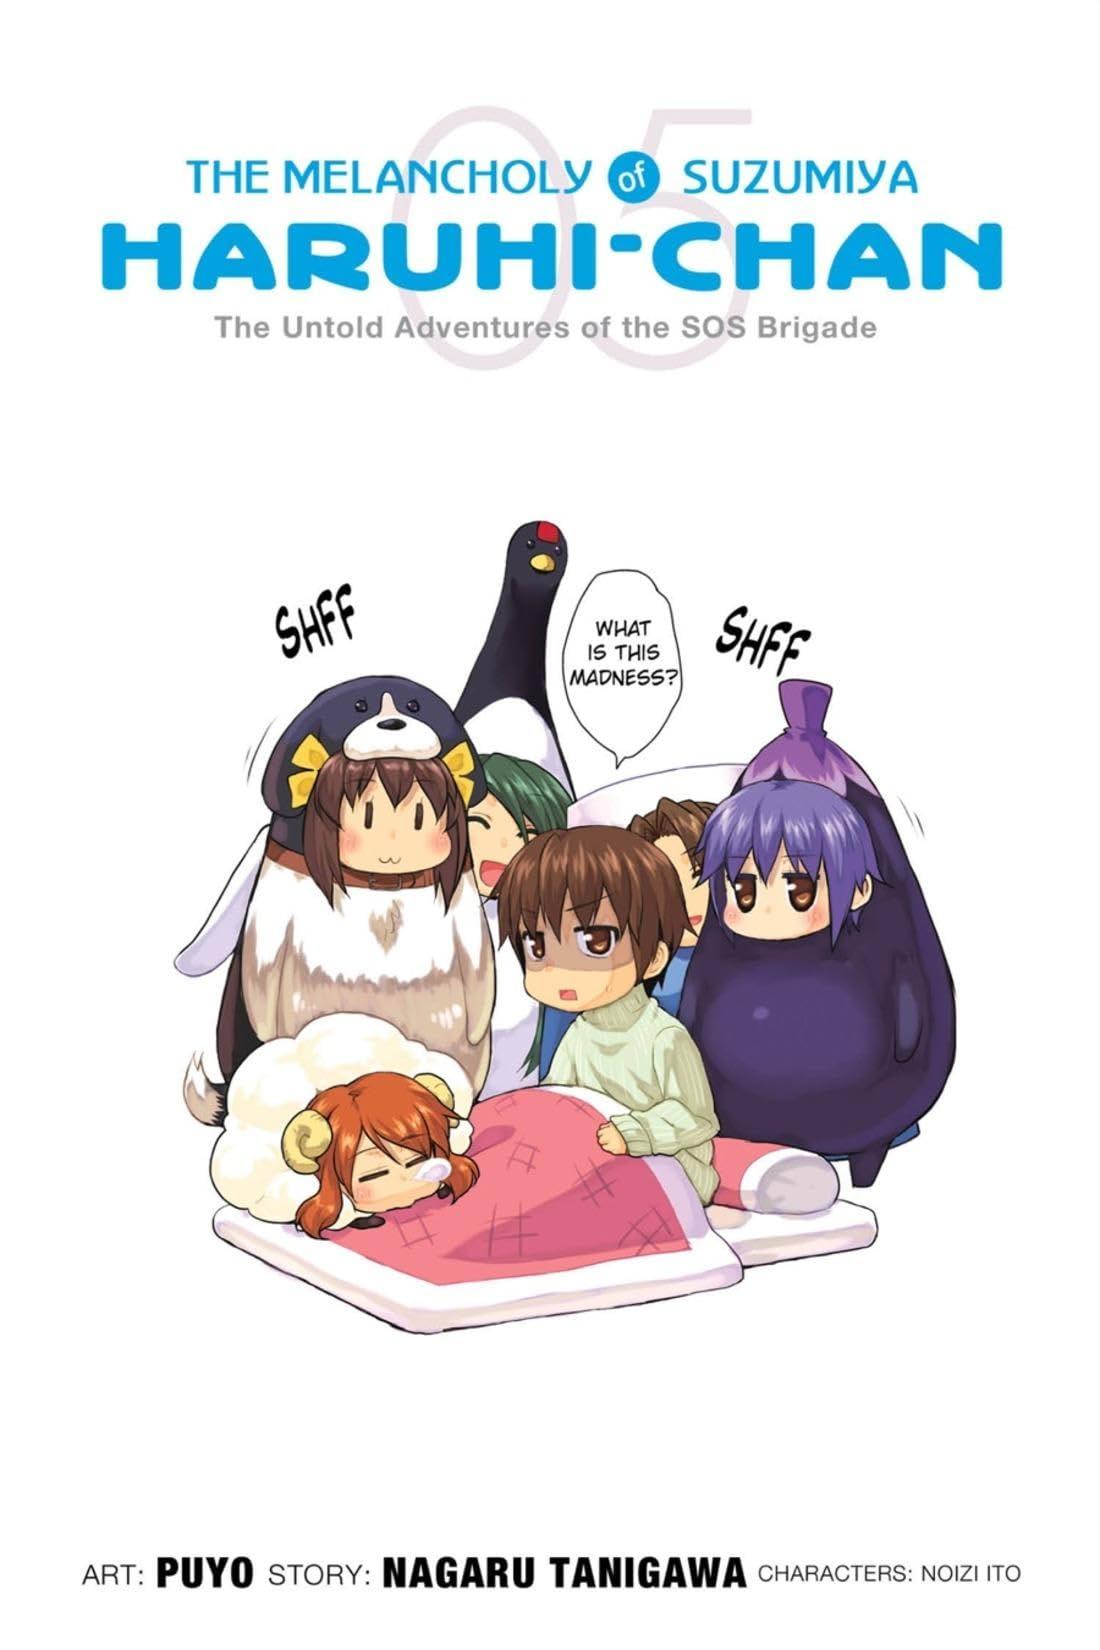 The Melancholy of Suzumiya Haruhi-chan Vol. 5